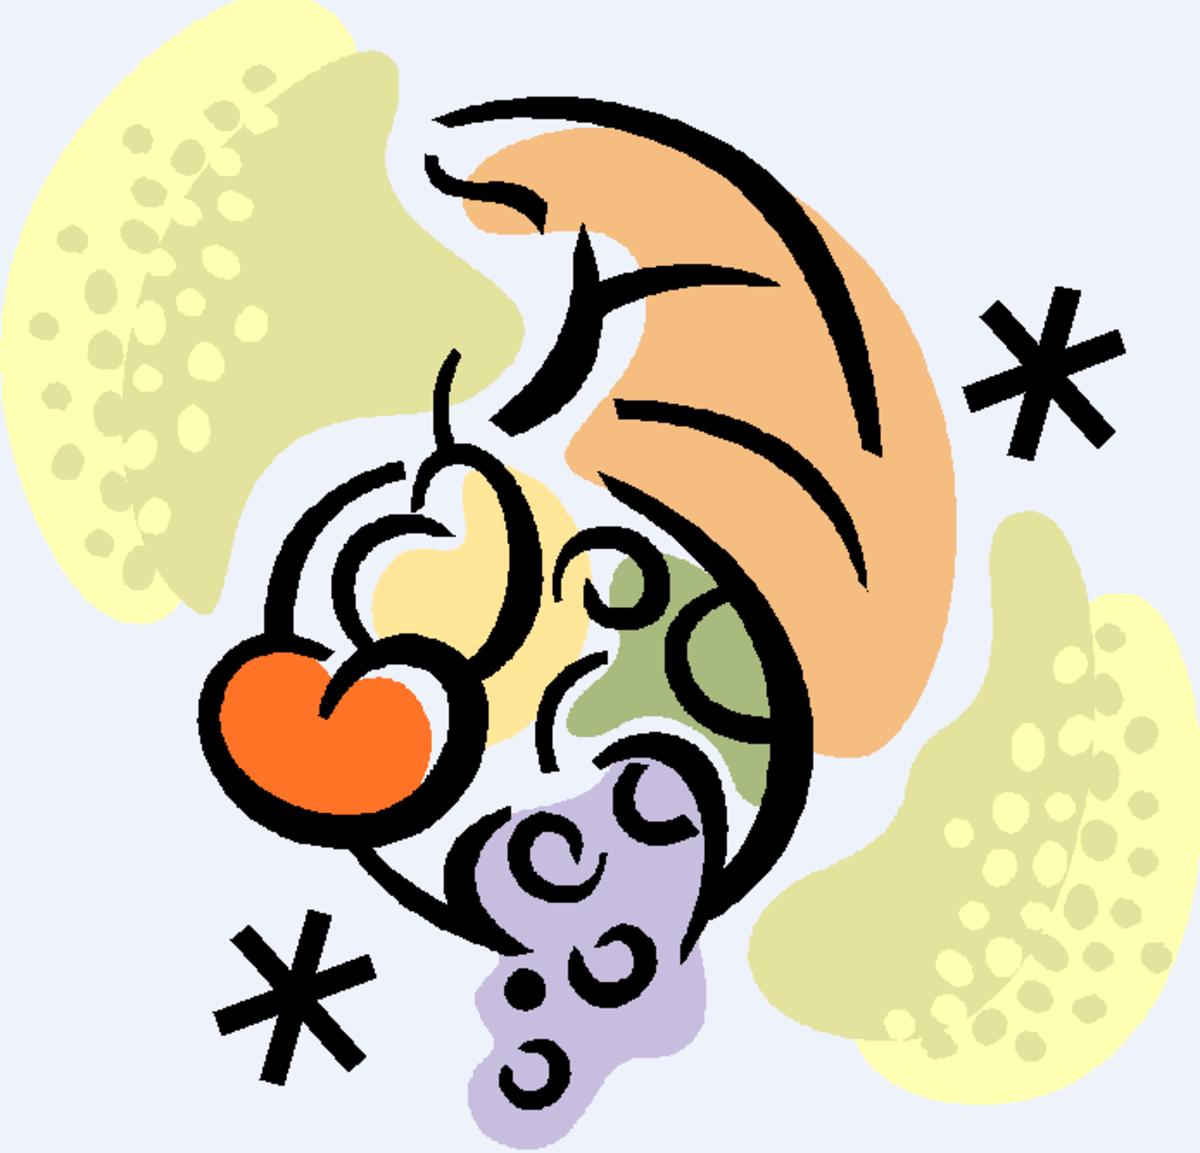 Cornucopia Graphic